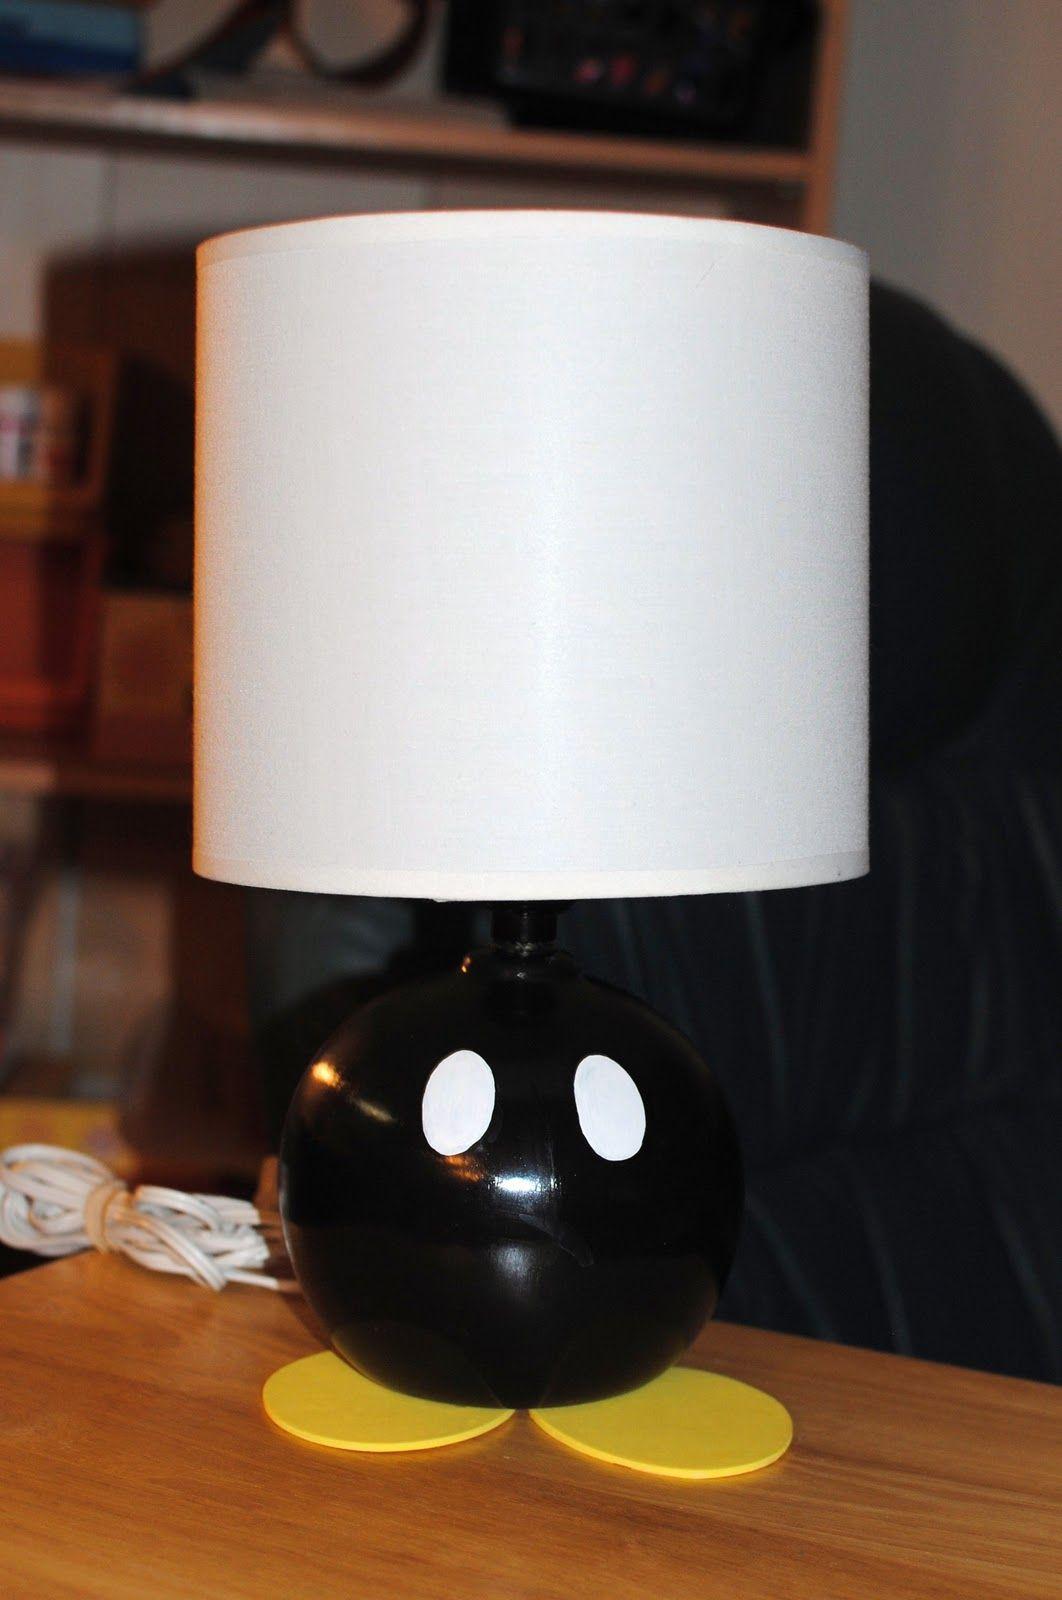 Bobomb Lamp Random Stuffs u Things Pinterest Game rooms Room